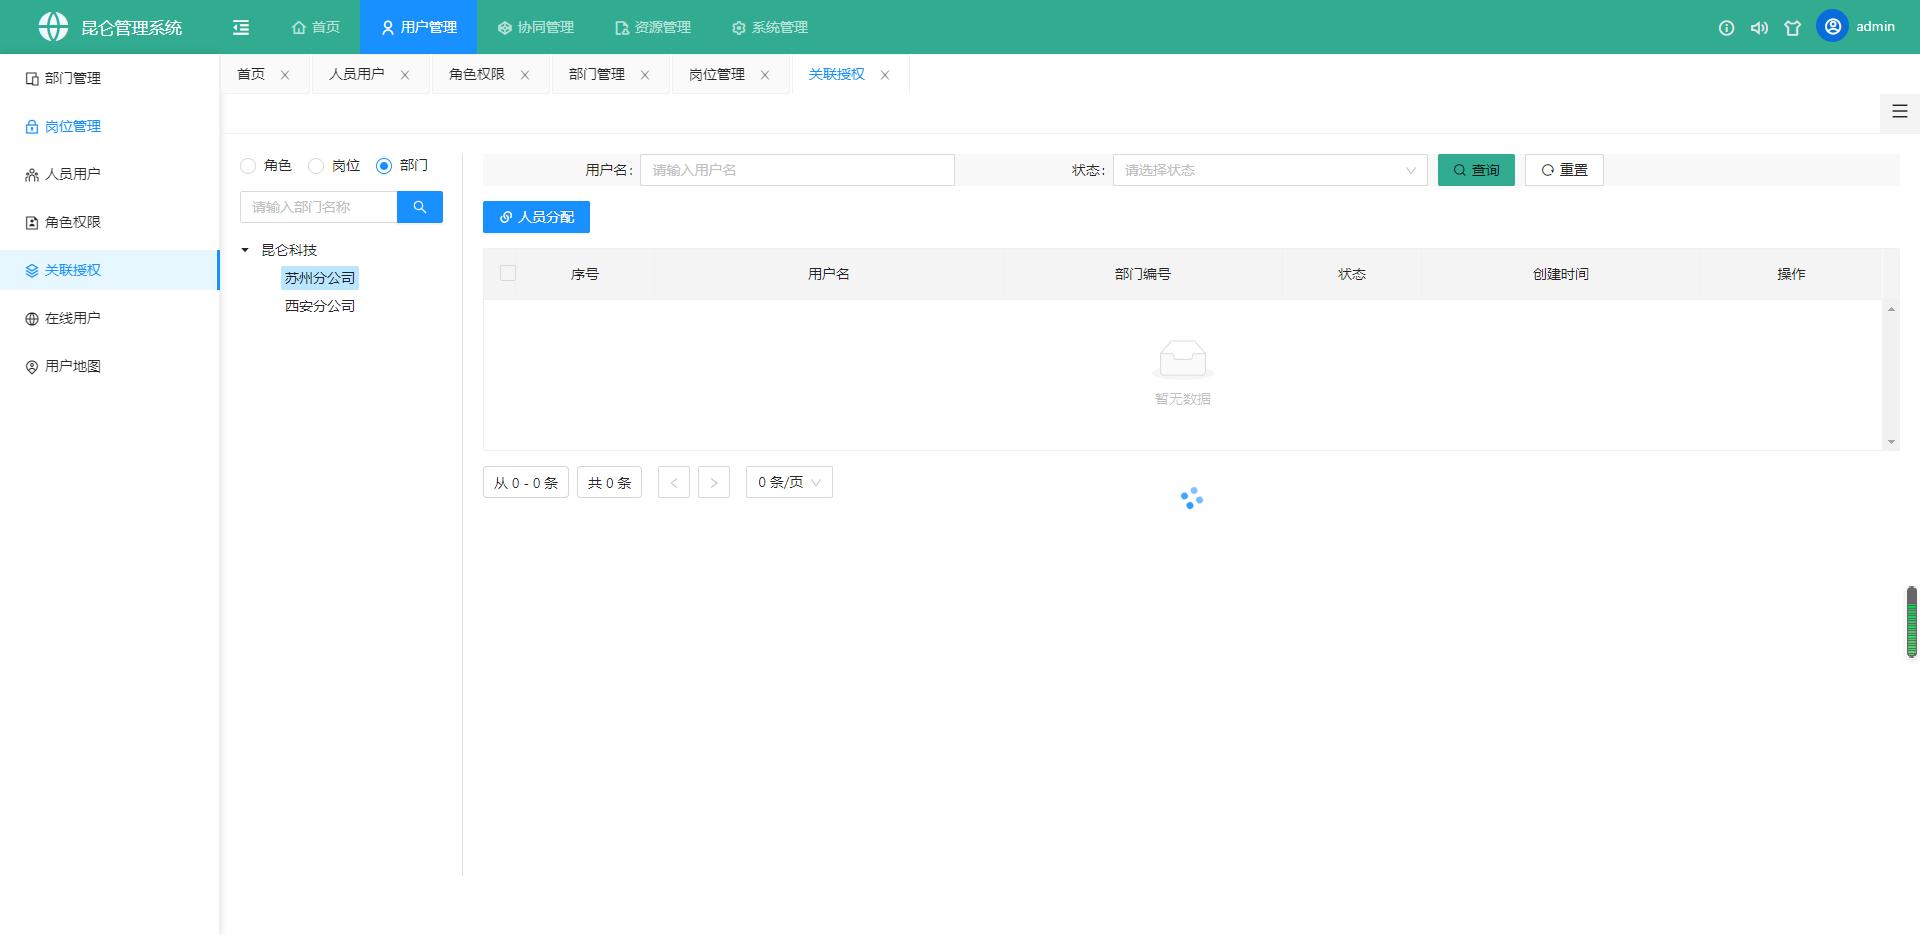 kunlun-admin v1.1.0 发布,后台管理系统